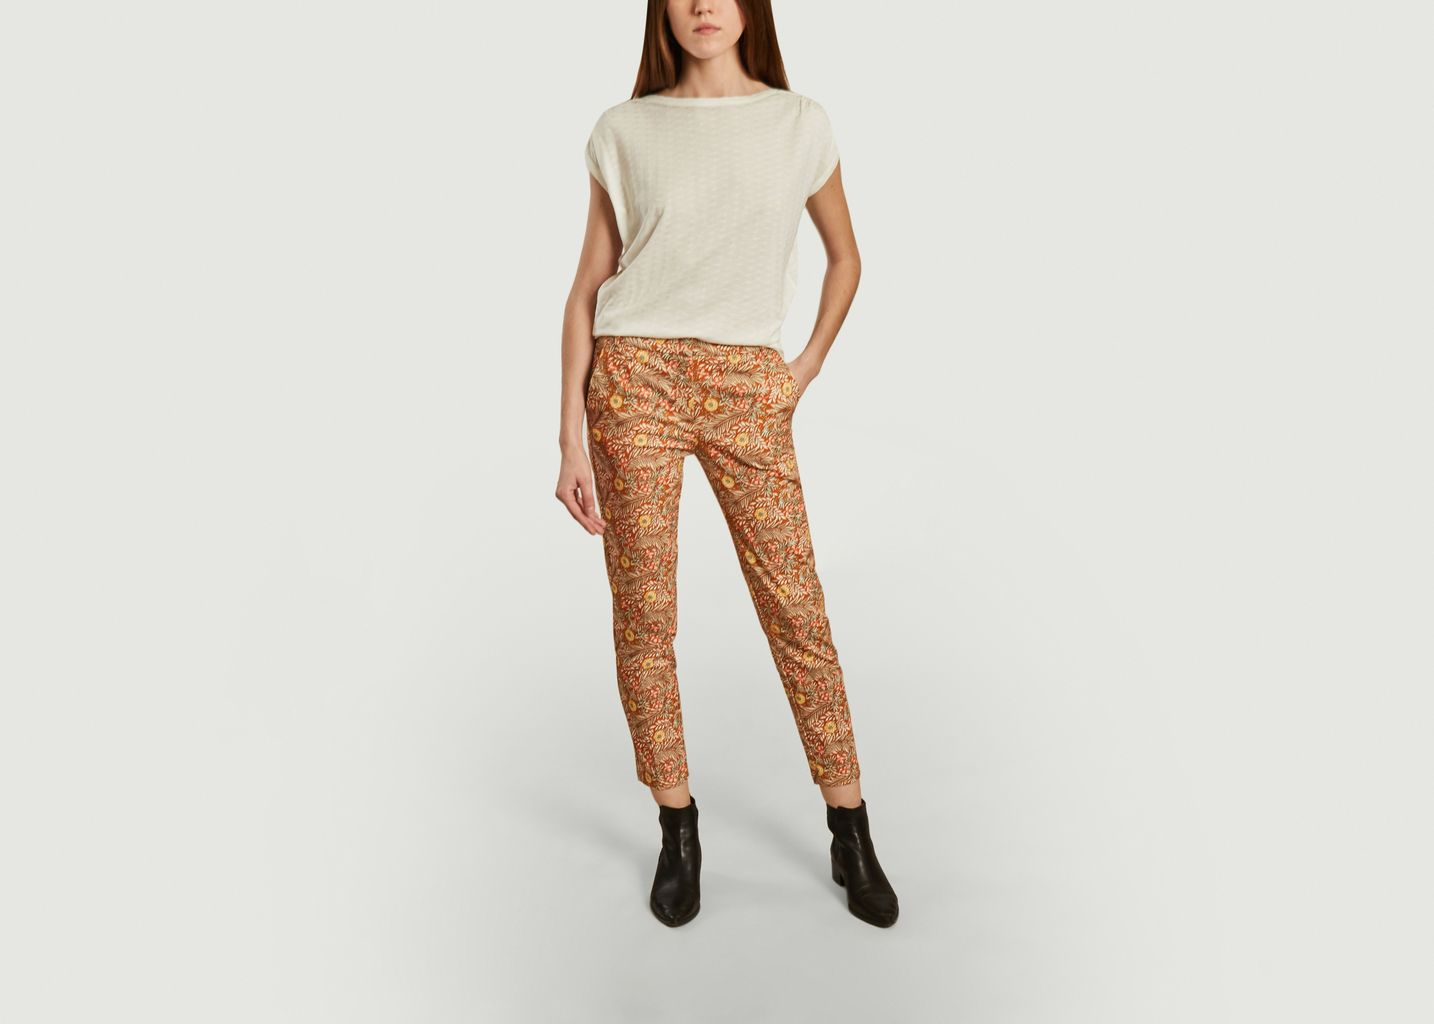 Pantalon Prairie - La Petite Française